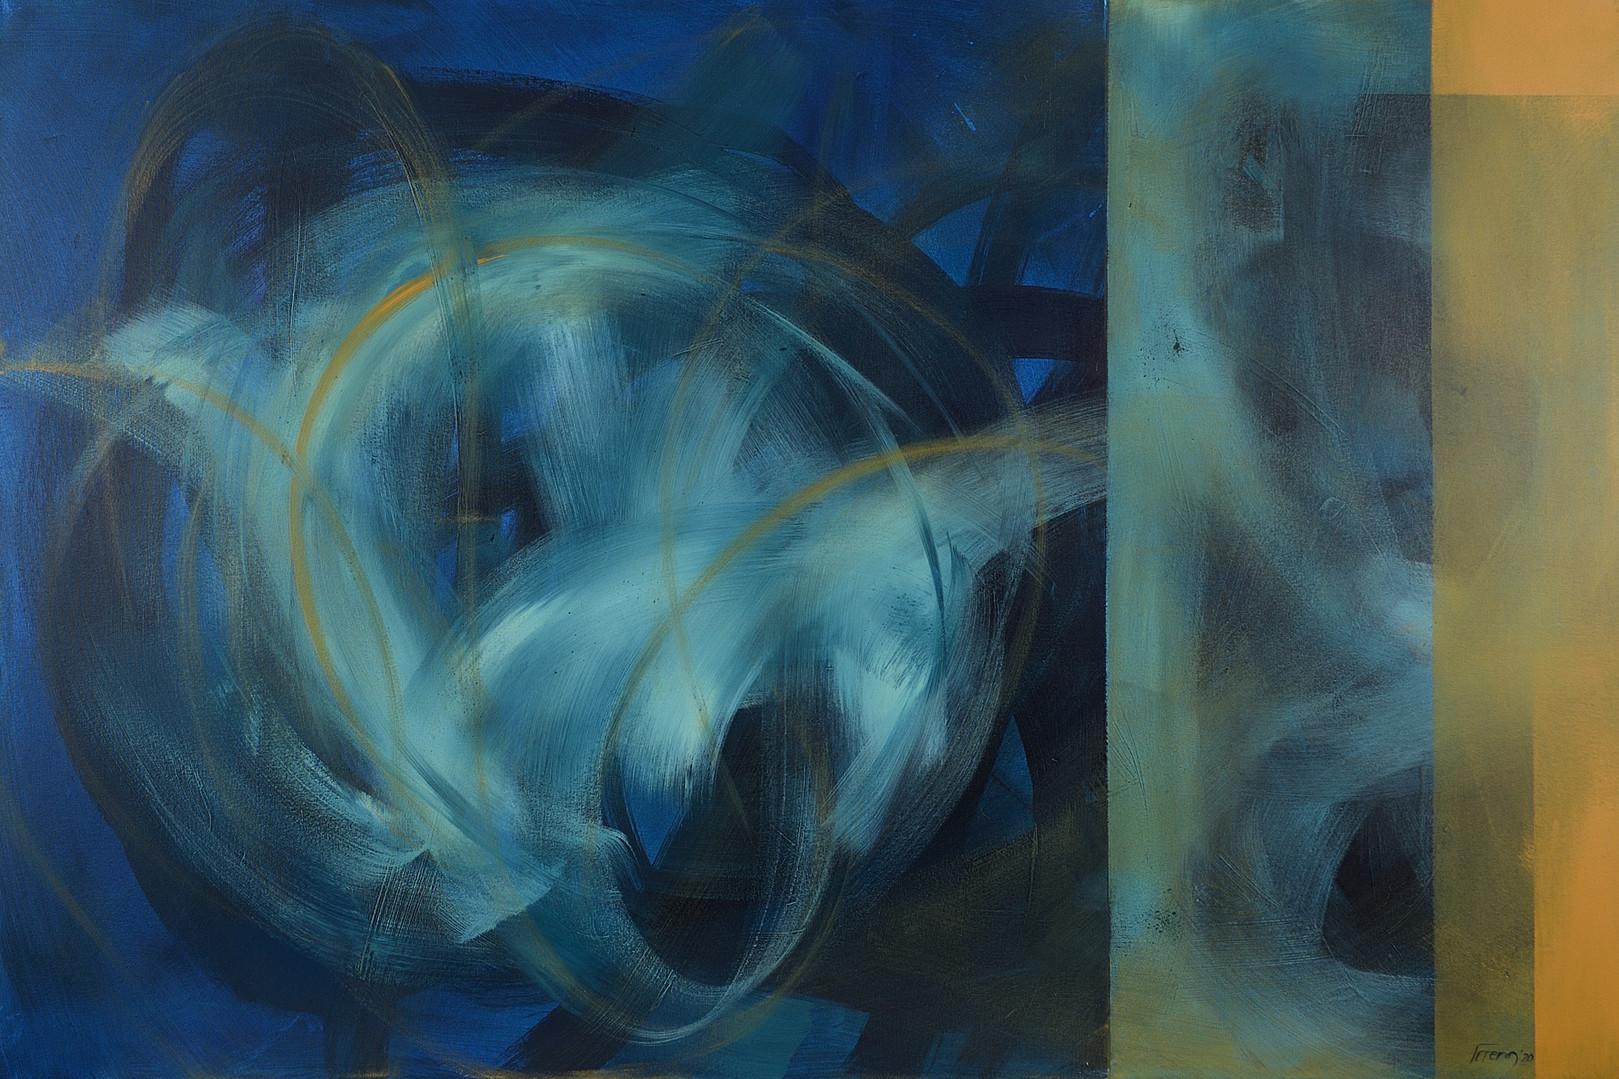 Nocturnal Blue #5